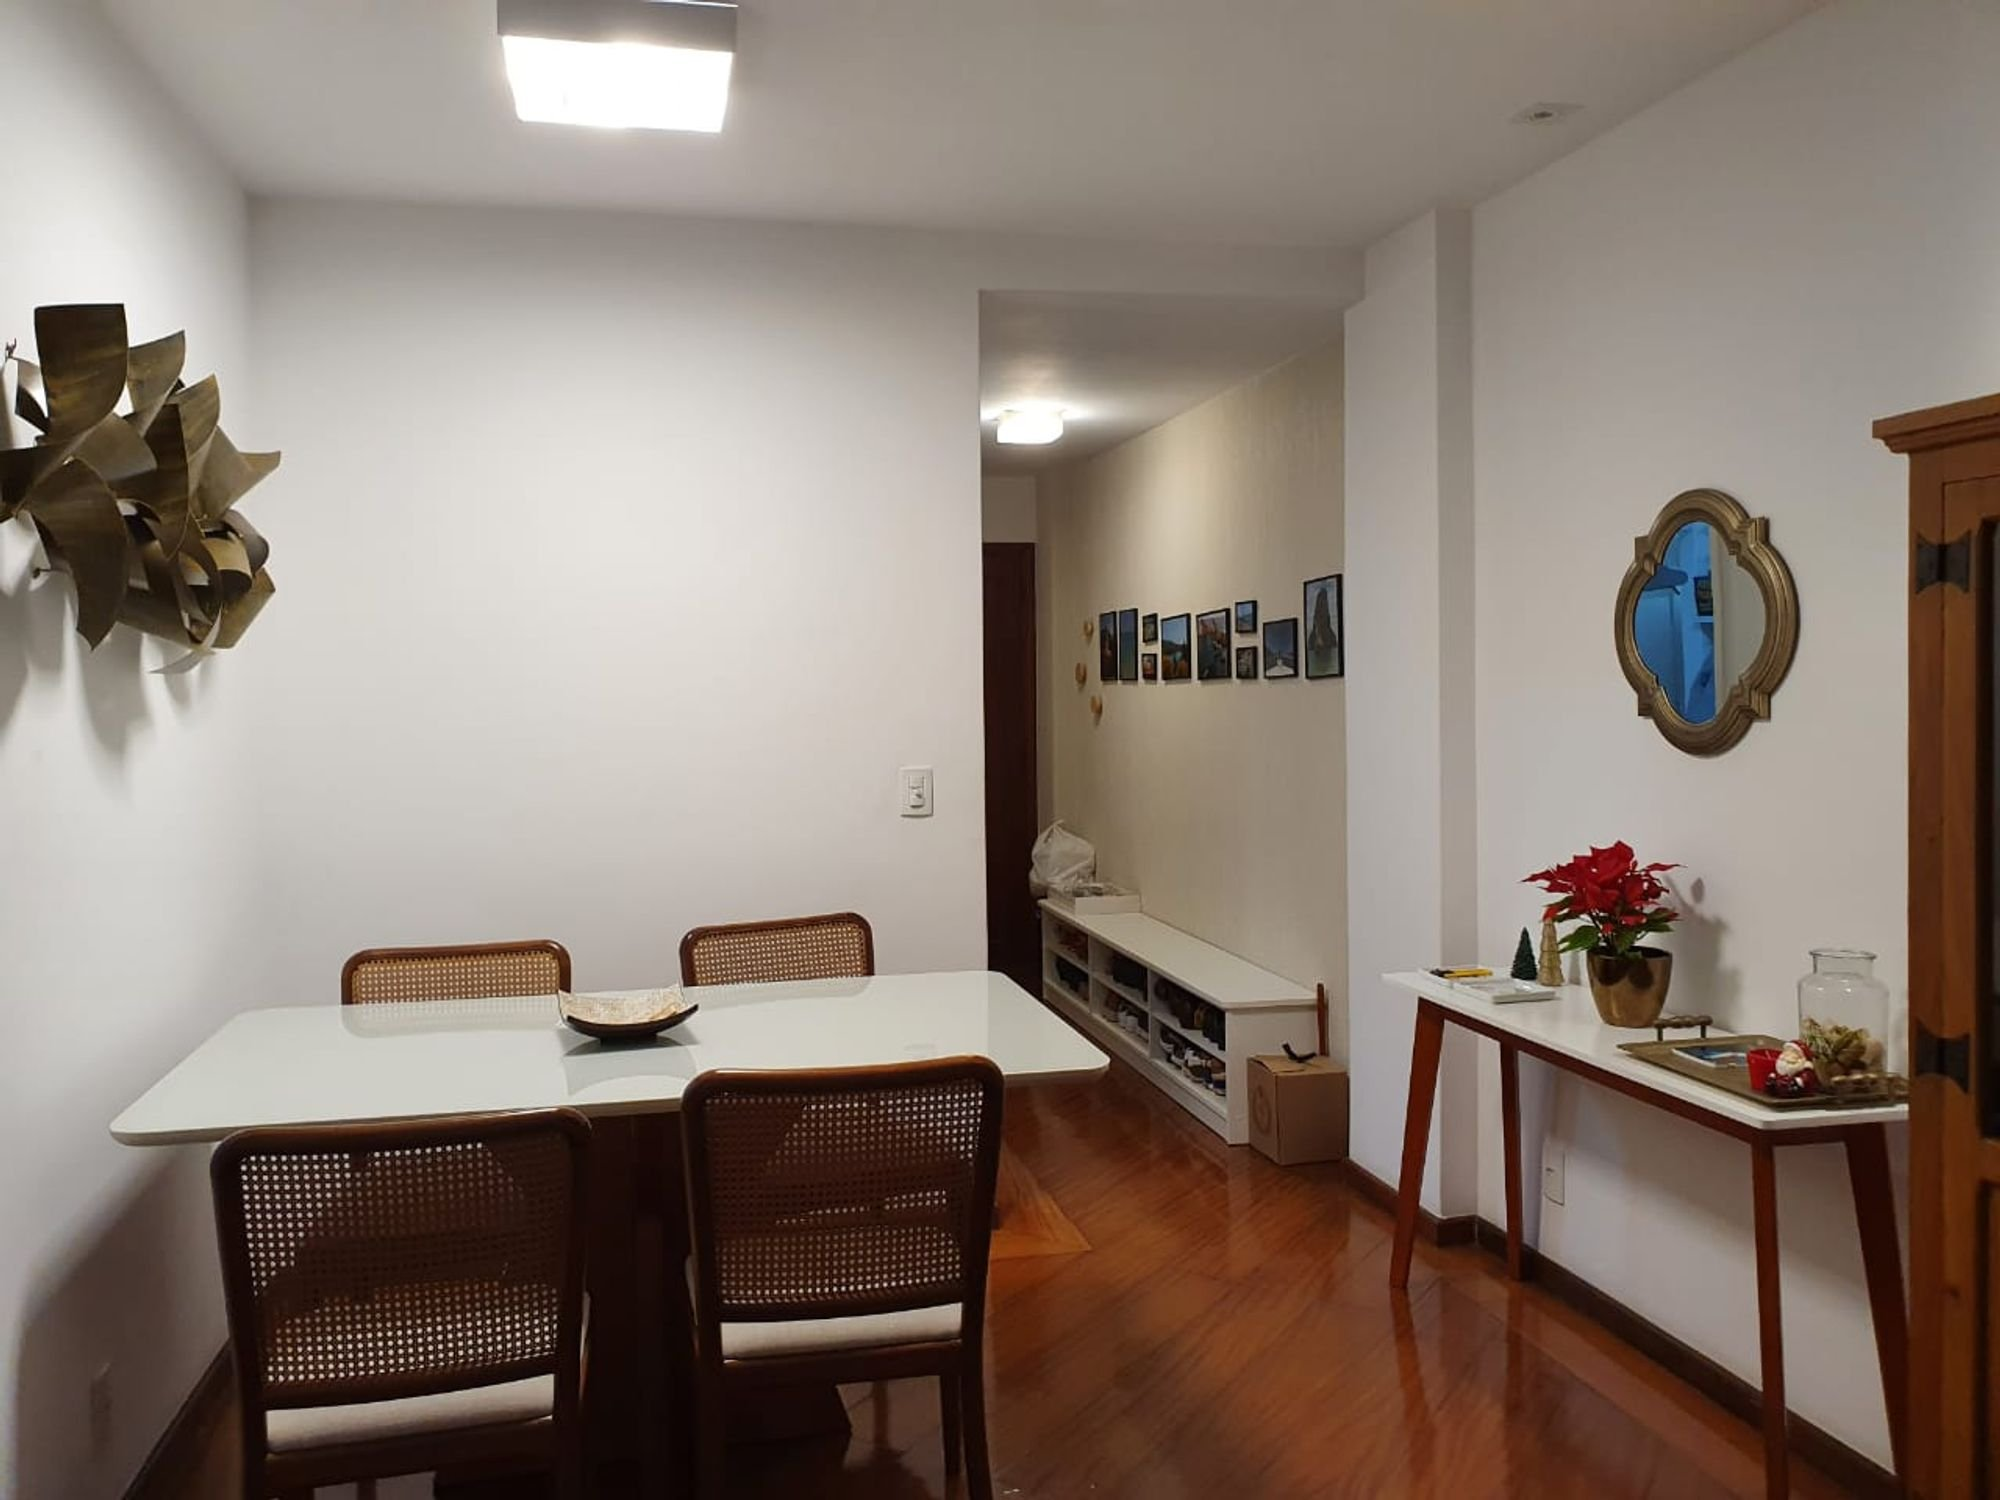 Foto de Sala com vaso de planta, vaso, tigela, cadeira, mesa de jantar